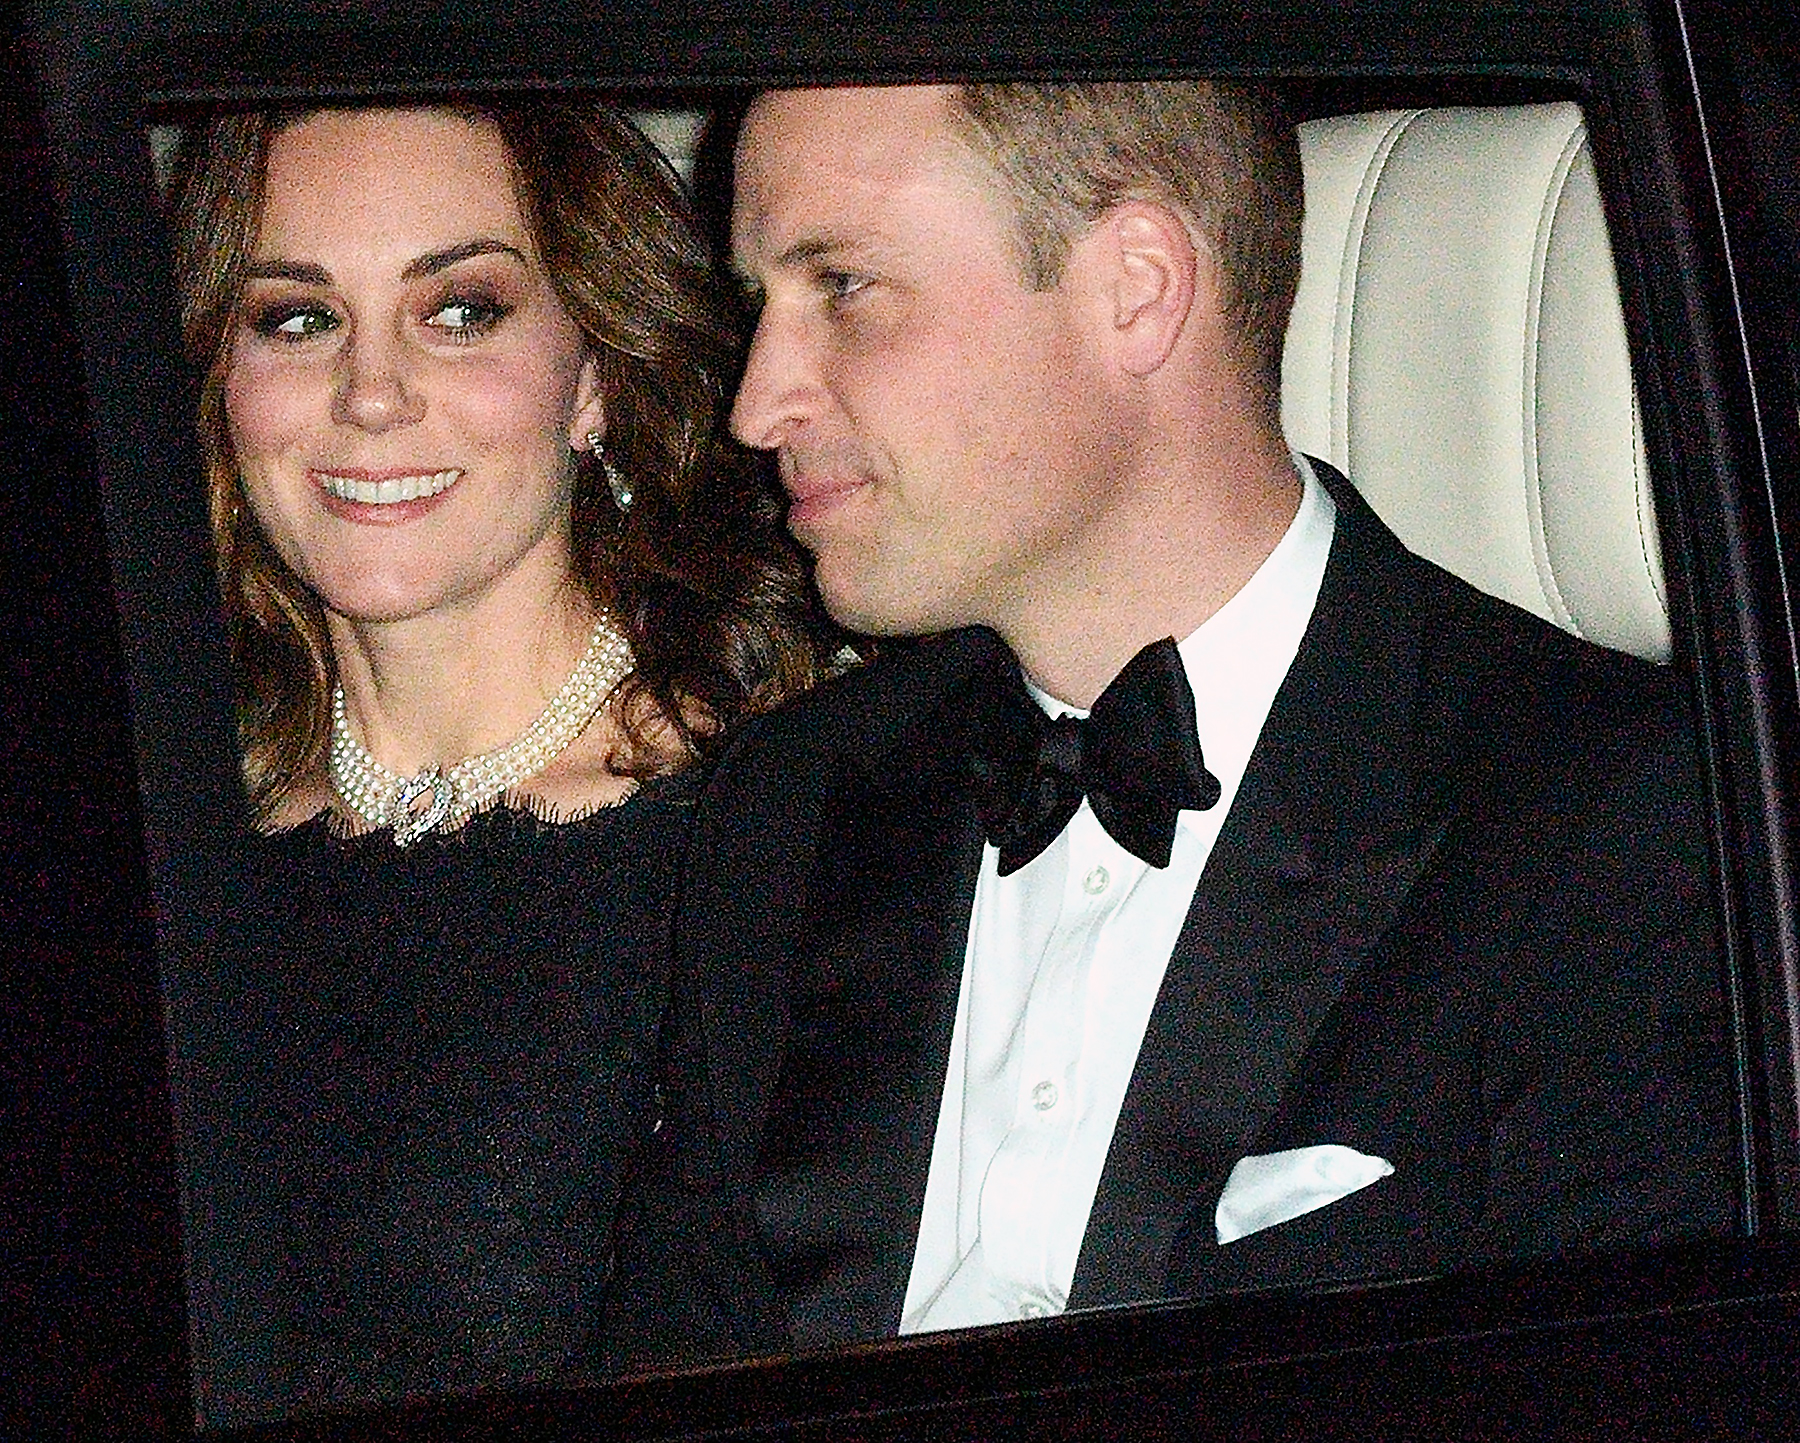 Kate Middleton Prince William wedding anniversary dinner